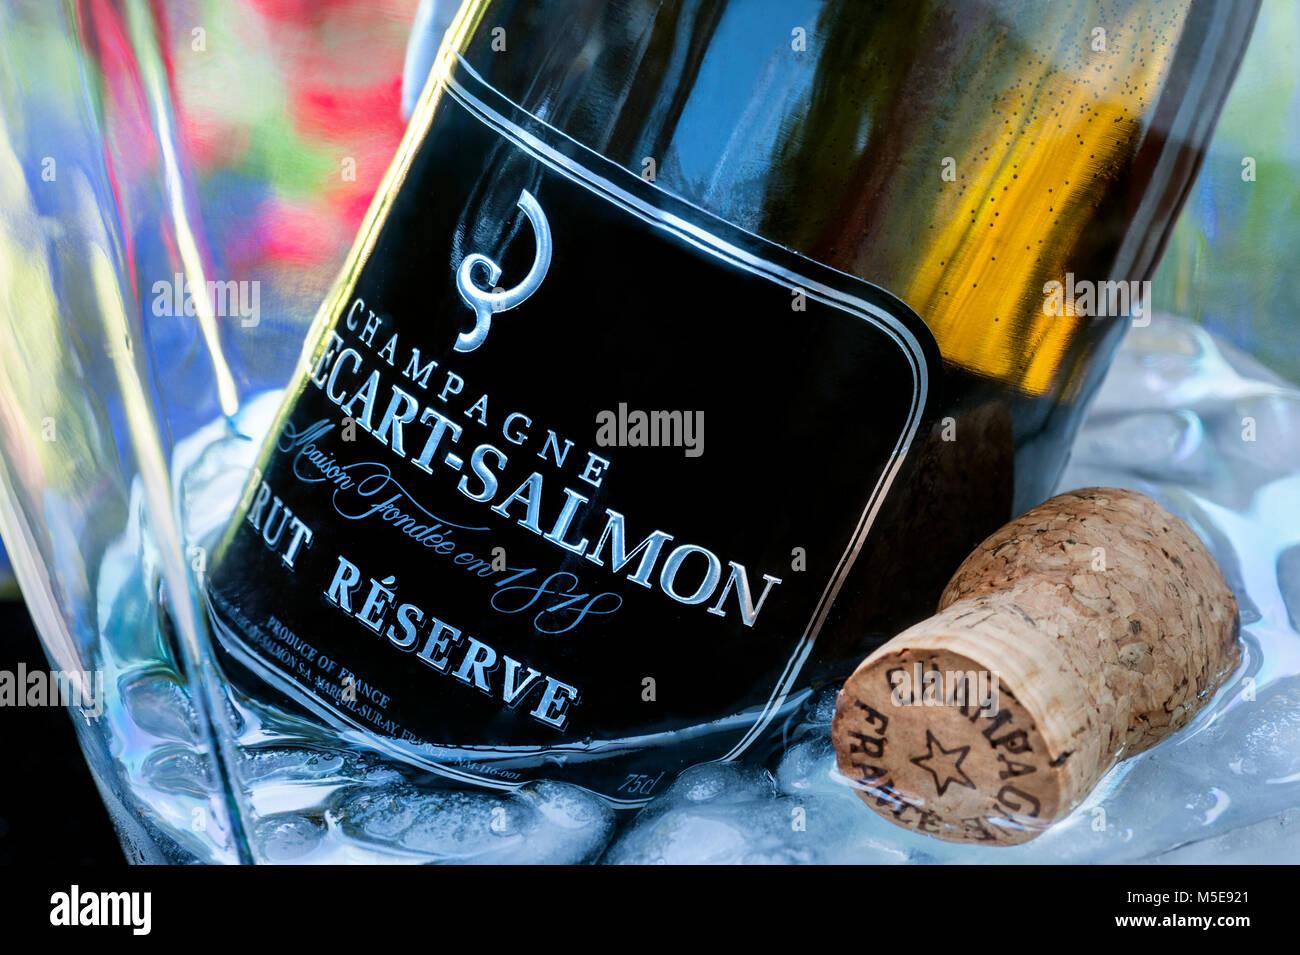 Brut Champagne Stockfotos & Brut Champagne Bilder - Alamy